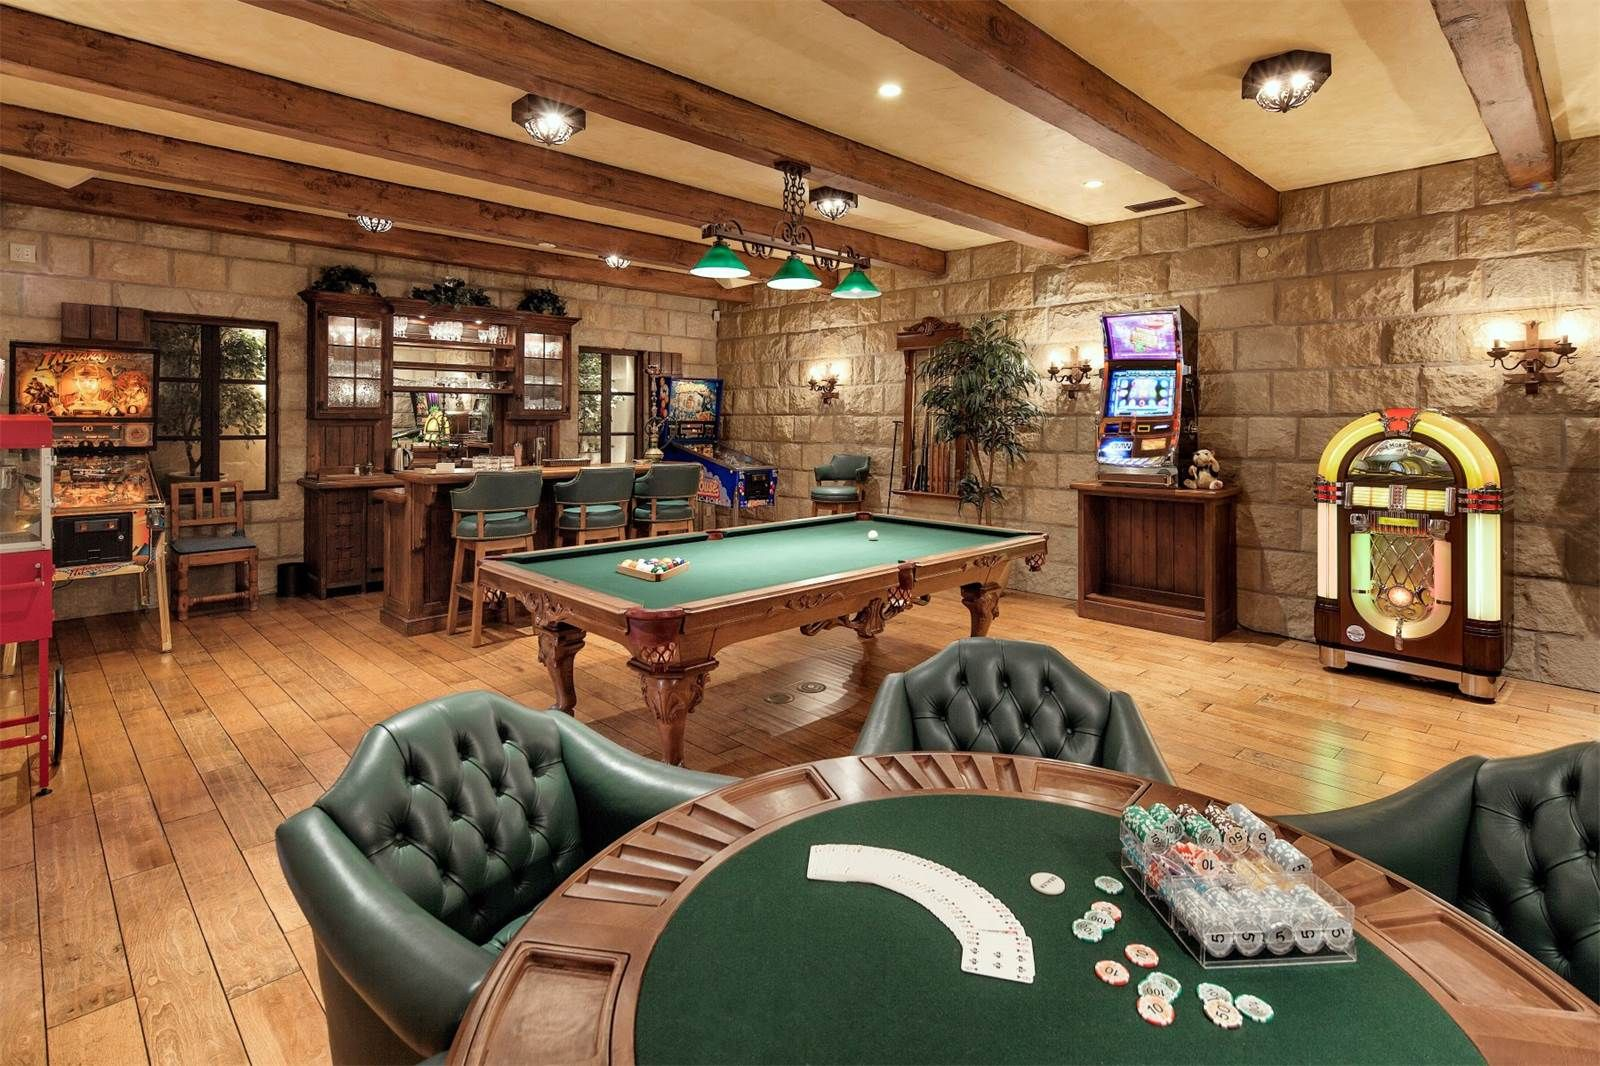 poker table juke box pinball machine pool table and. Black Bedroom Furniture Sets. Home Design Ideas